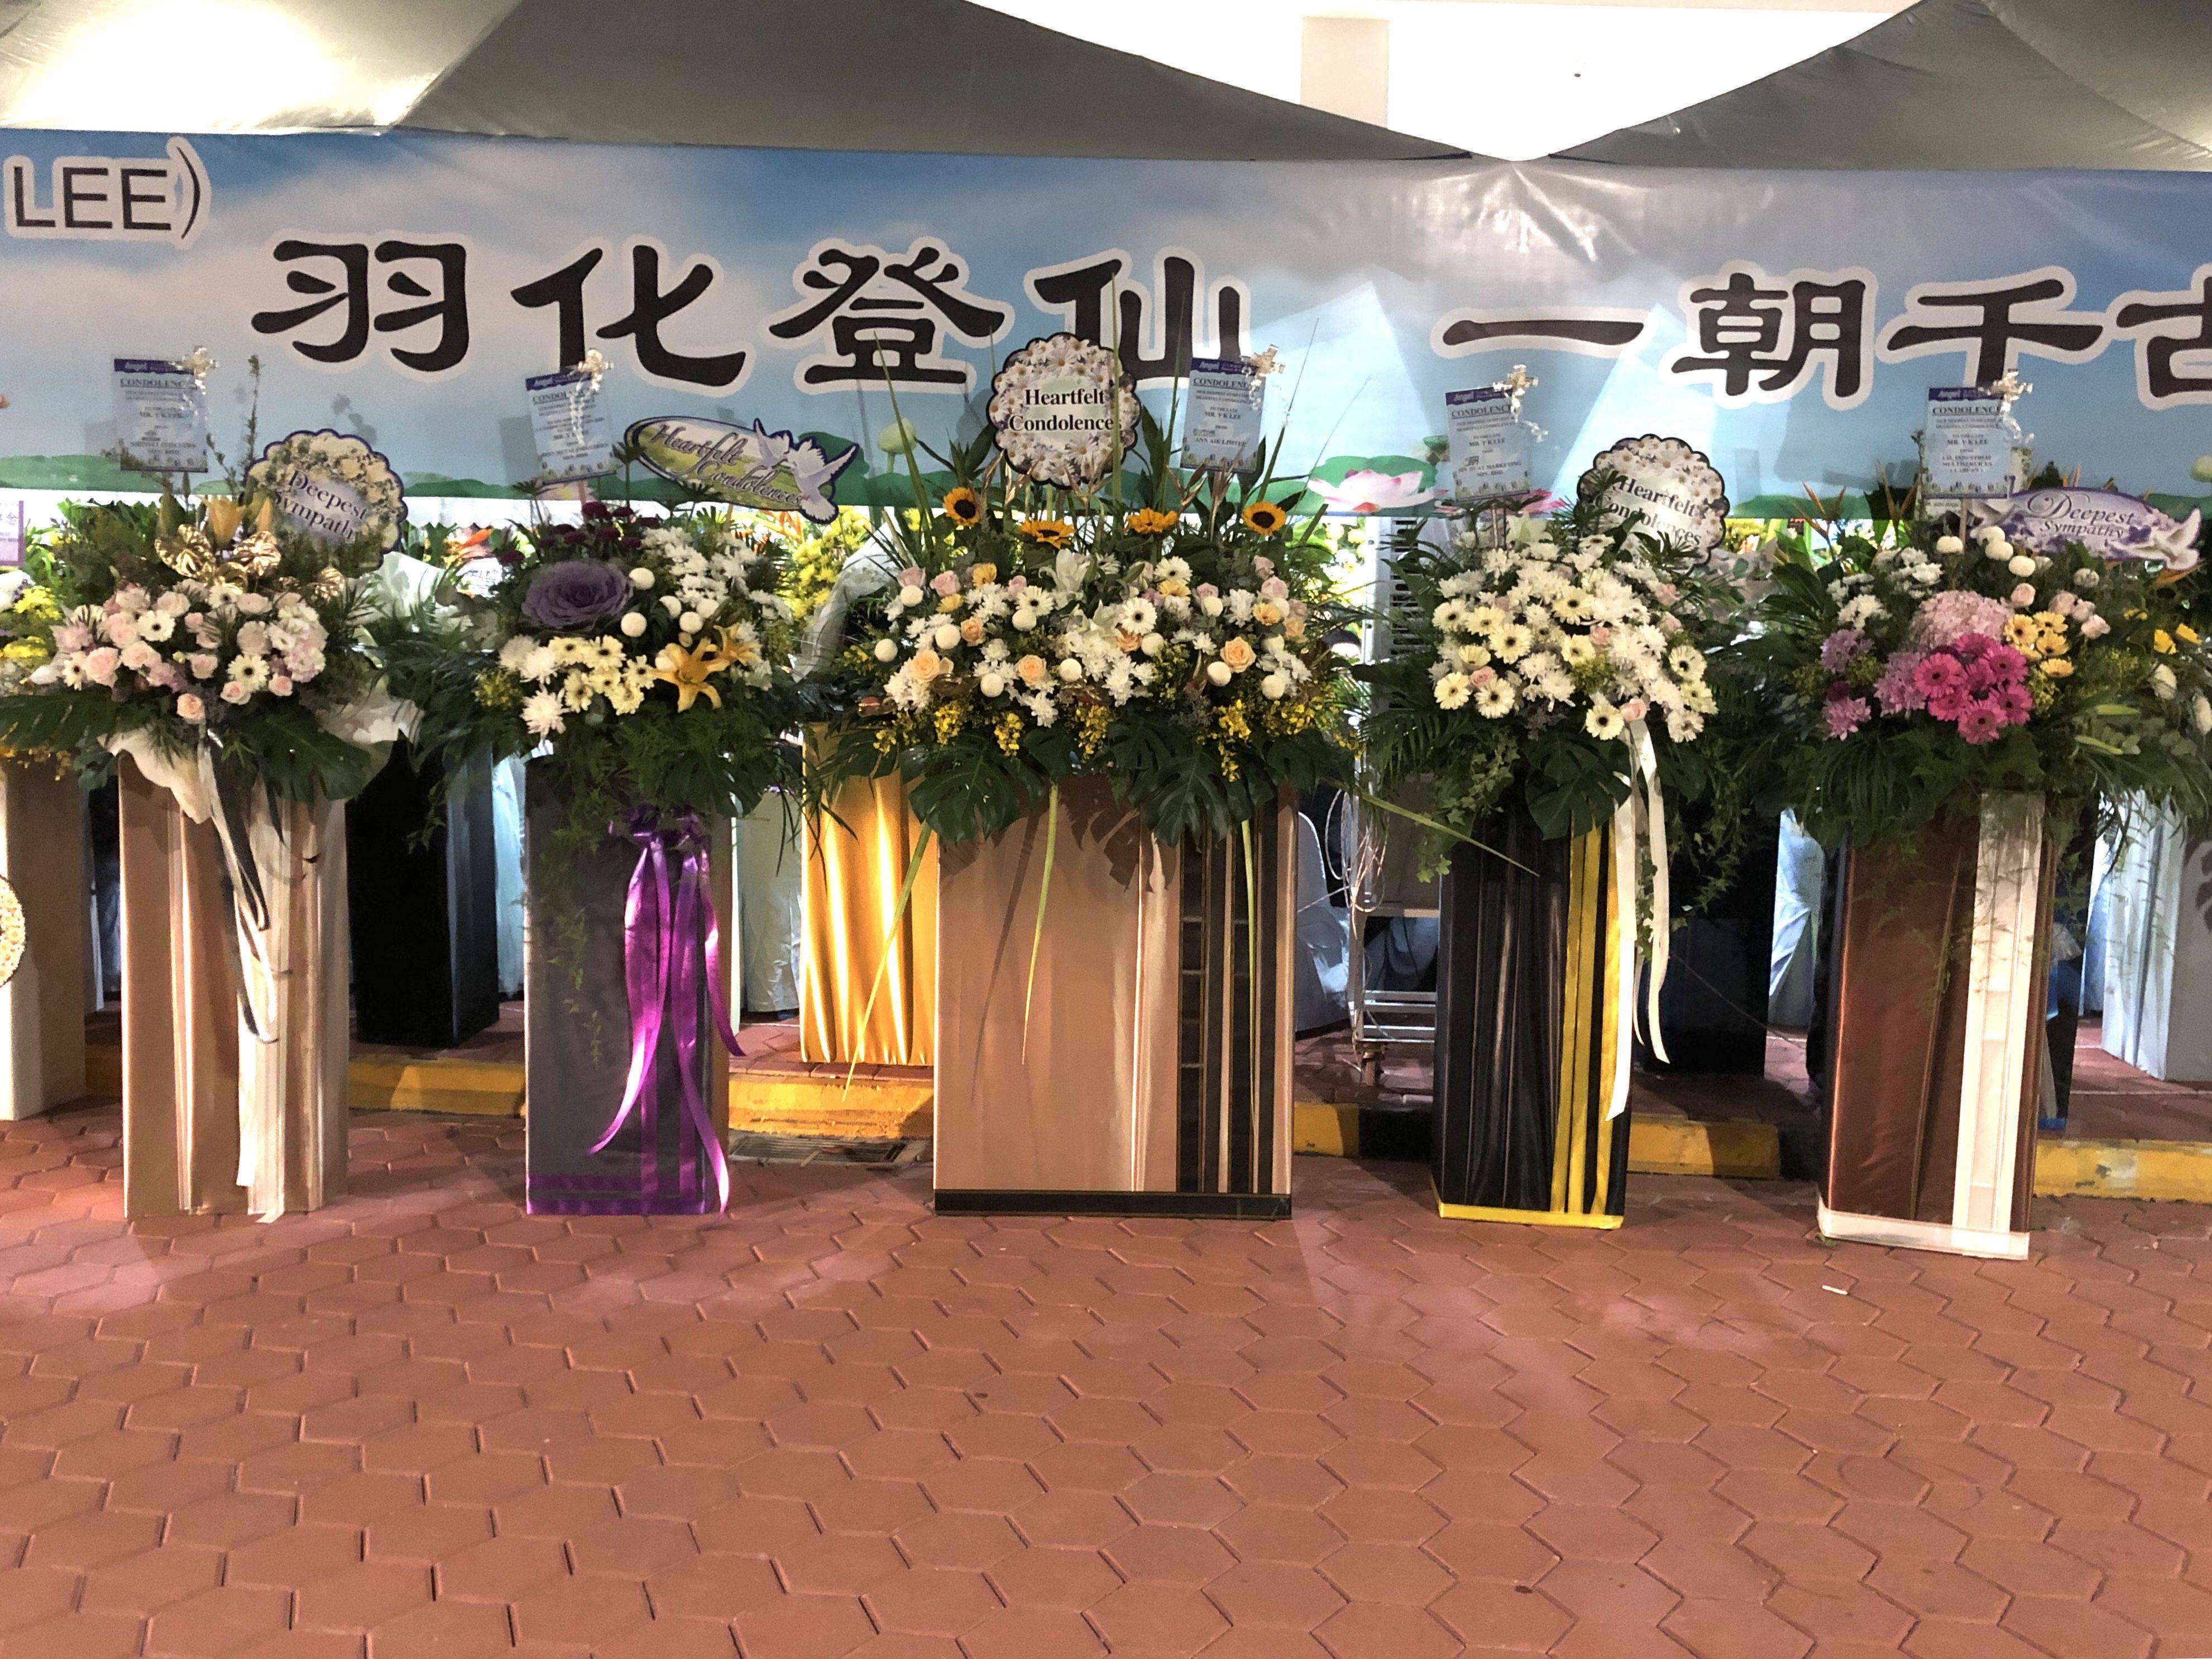 Openingflower Condolencesflower 手花 情人节花束 毕业花束 气球花束 结婚手花 韩式花束 热气球花盒 开张花 花圈 丧事花圈 Malaysia Johor Bahru Jbflor Table Decorations